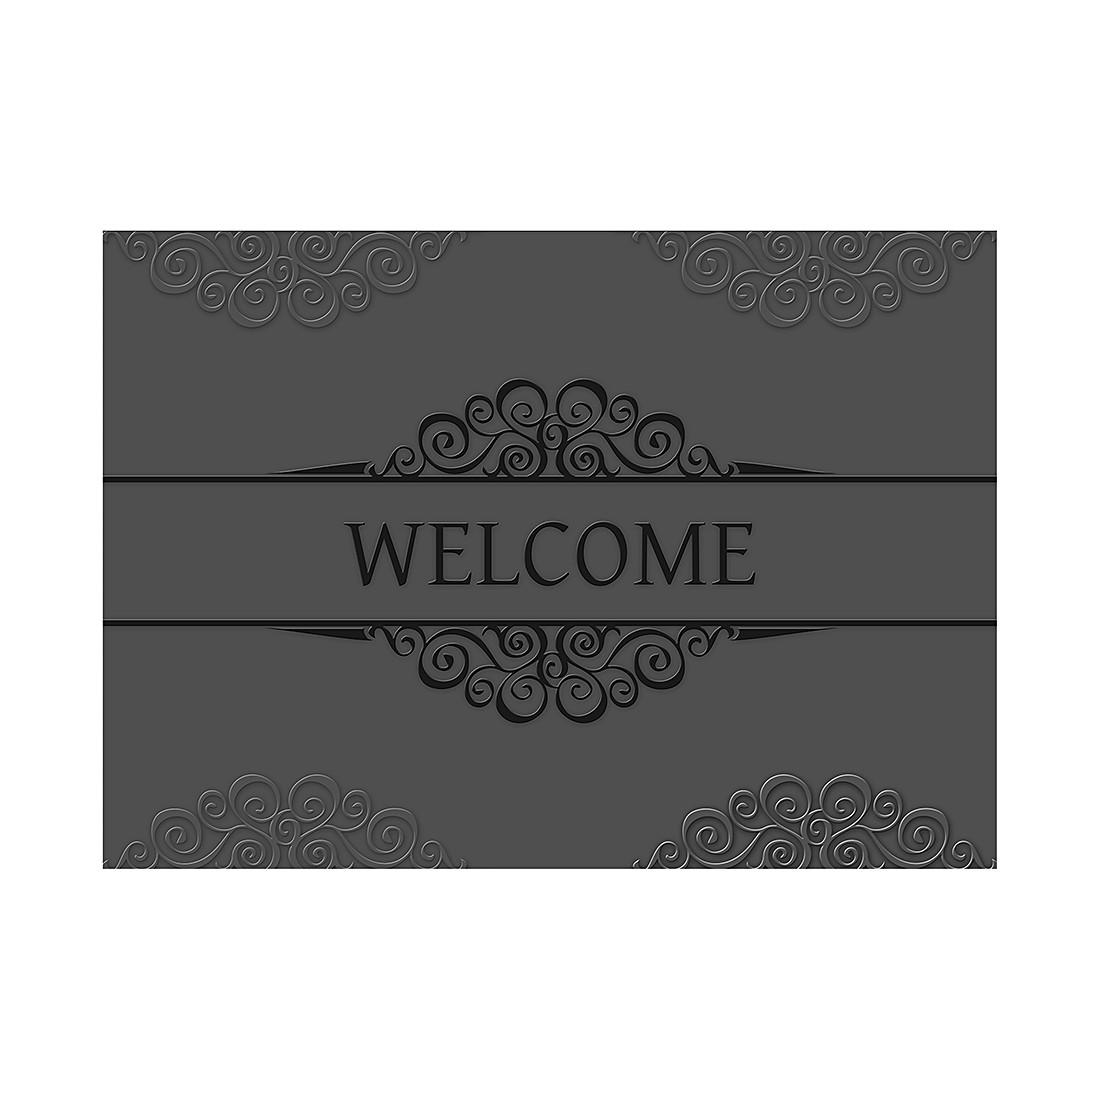 Fu matte barock welcome grau schwarz pro art g nstig - Babyzimmer barock ...